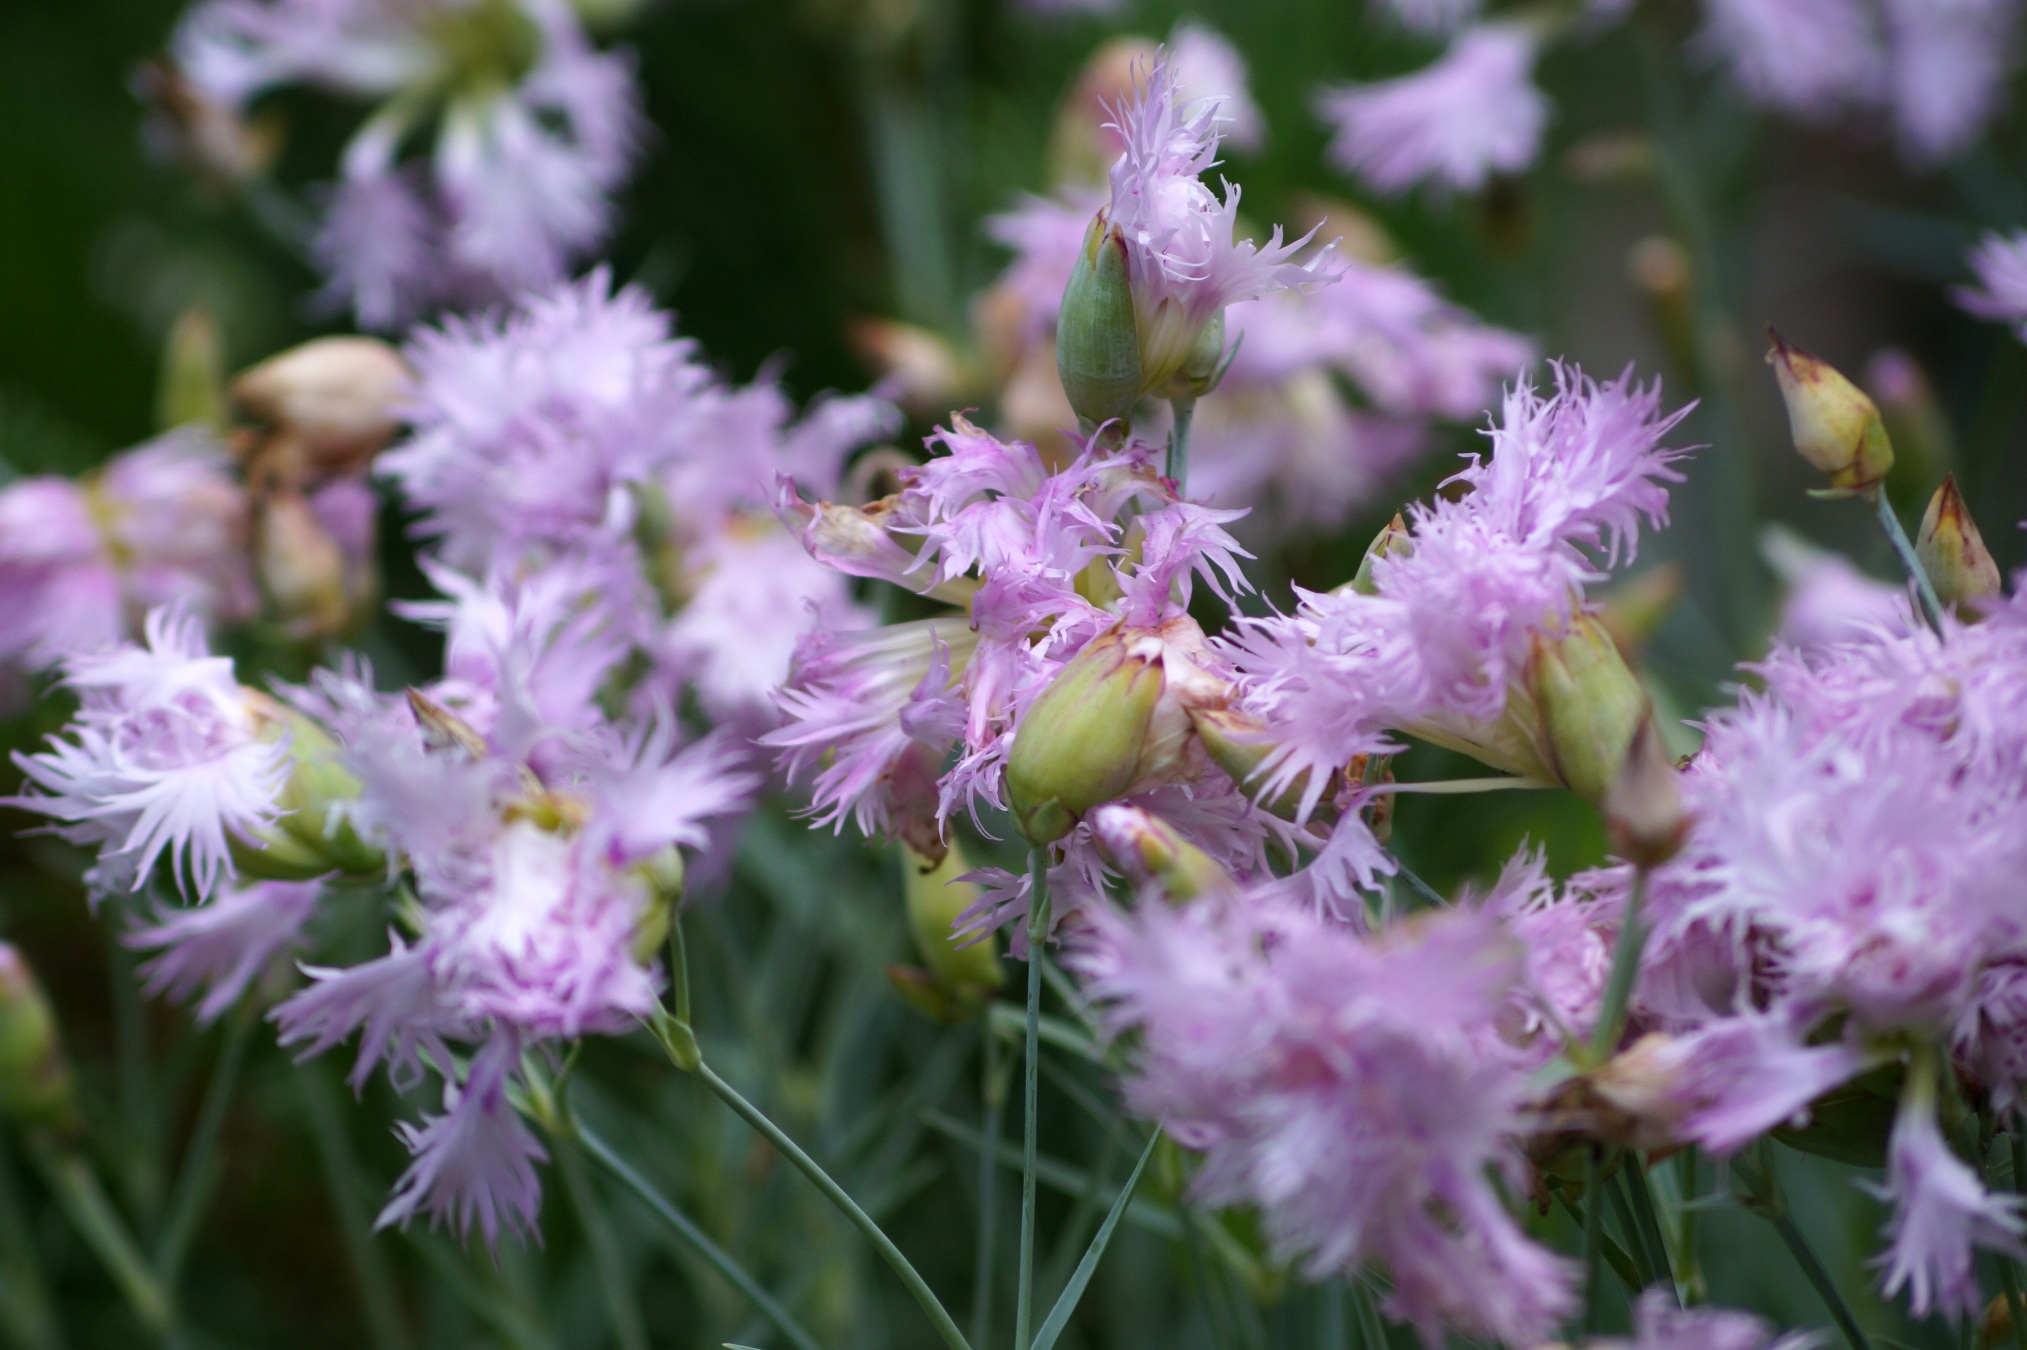 Dianthus plumarius – goździk pierzasty